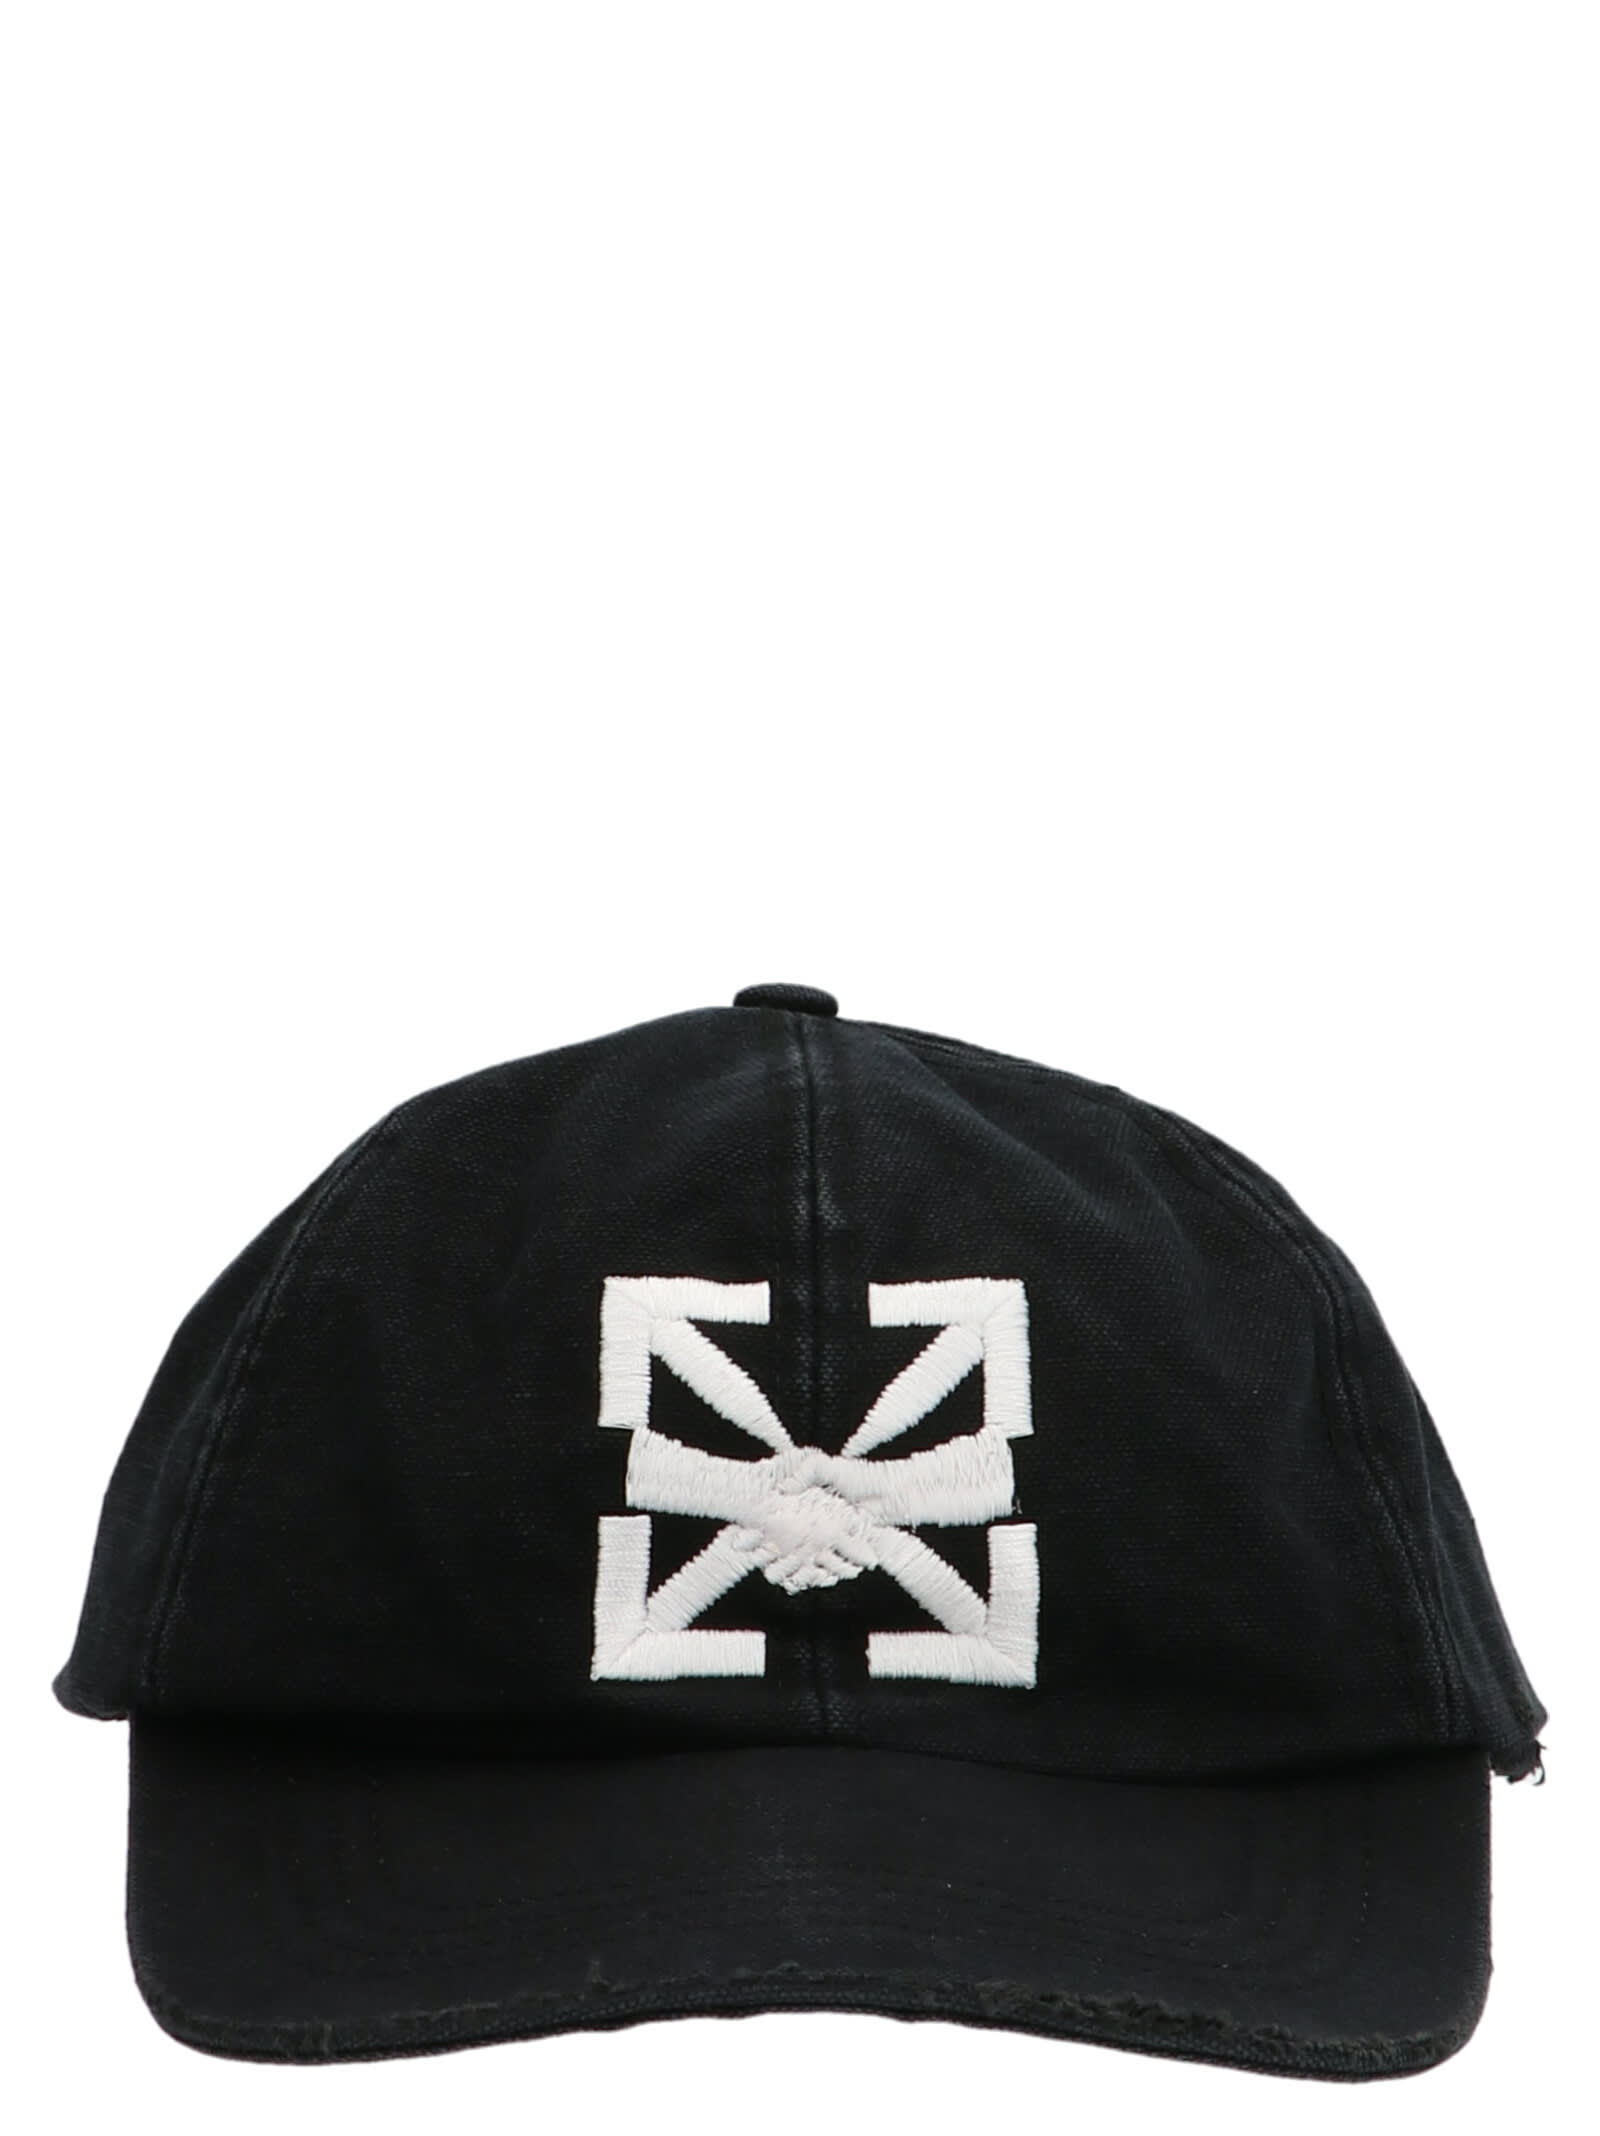 Off-White Caps OFF-WHITE AGREEMENT CAP